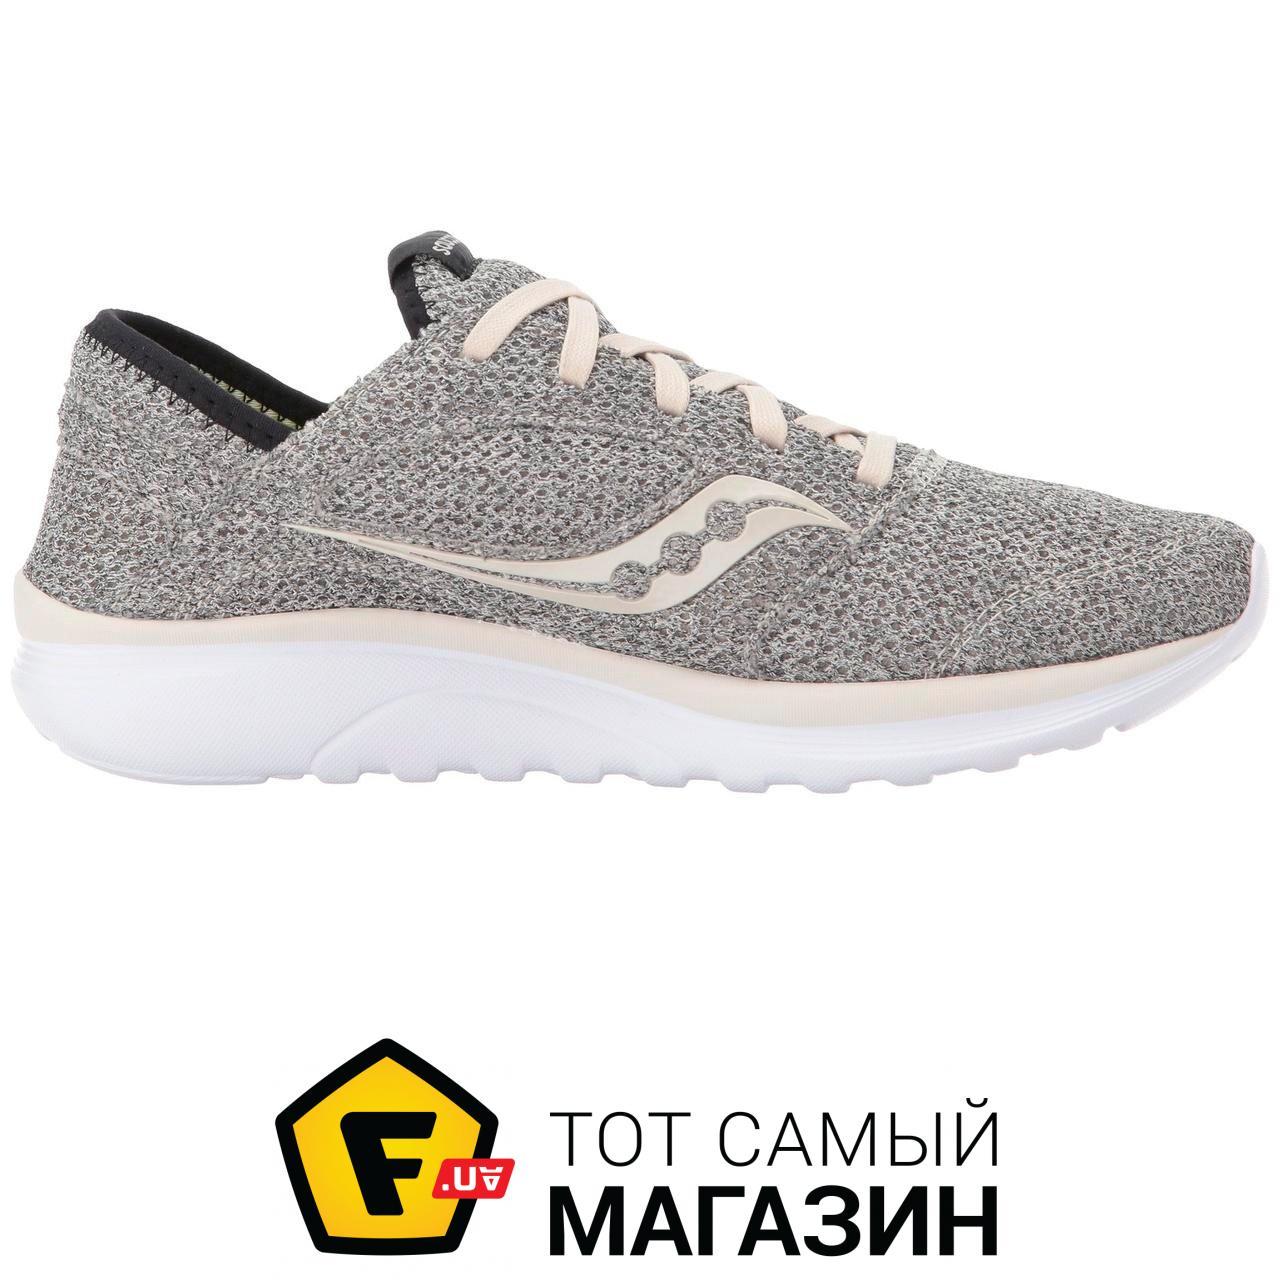 1fdd70920f1d ᐈ SAUCONY Kineta Relay 8.5, grey beige (15244-64s) ~ ЦЕНА Снижена ...